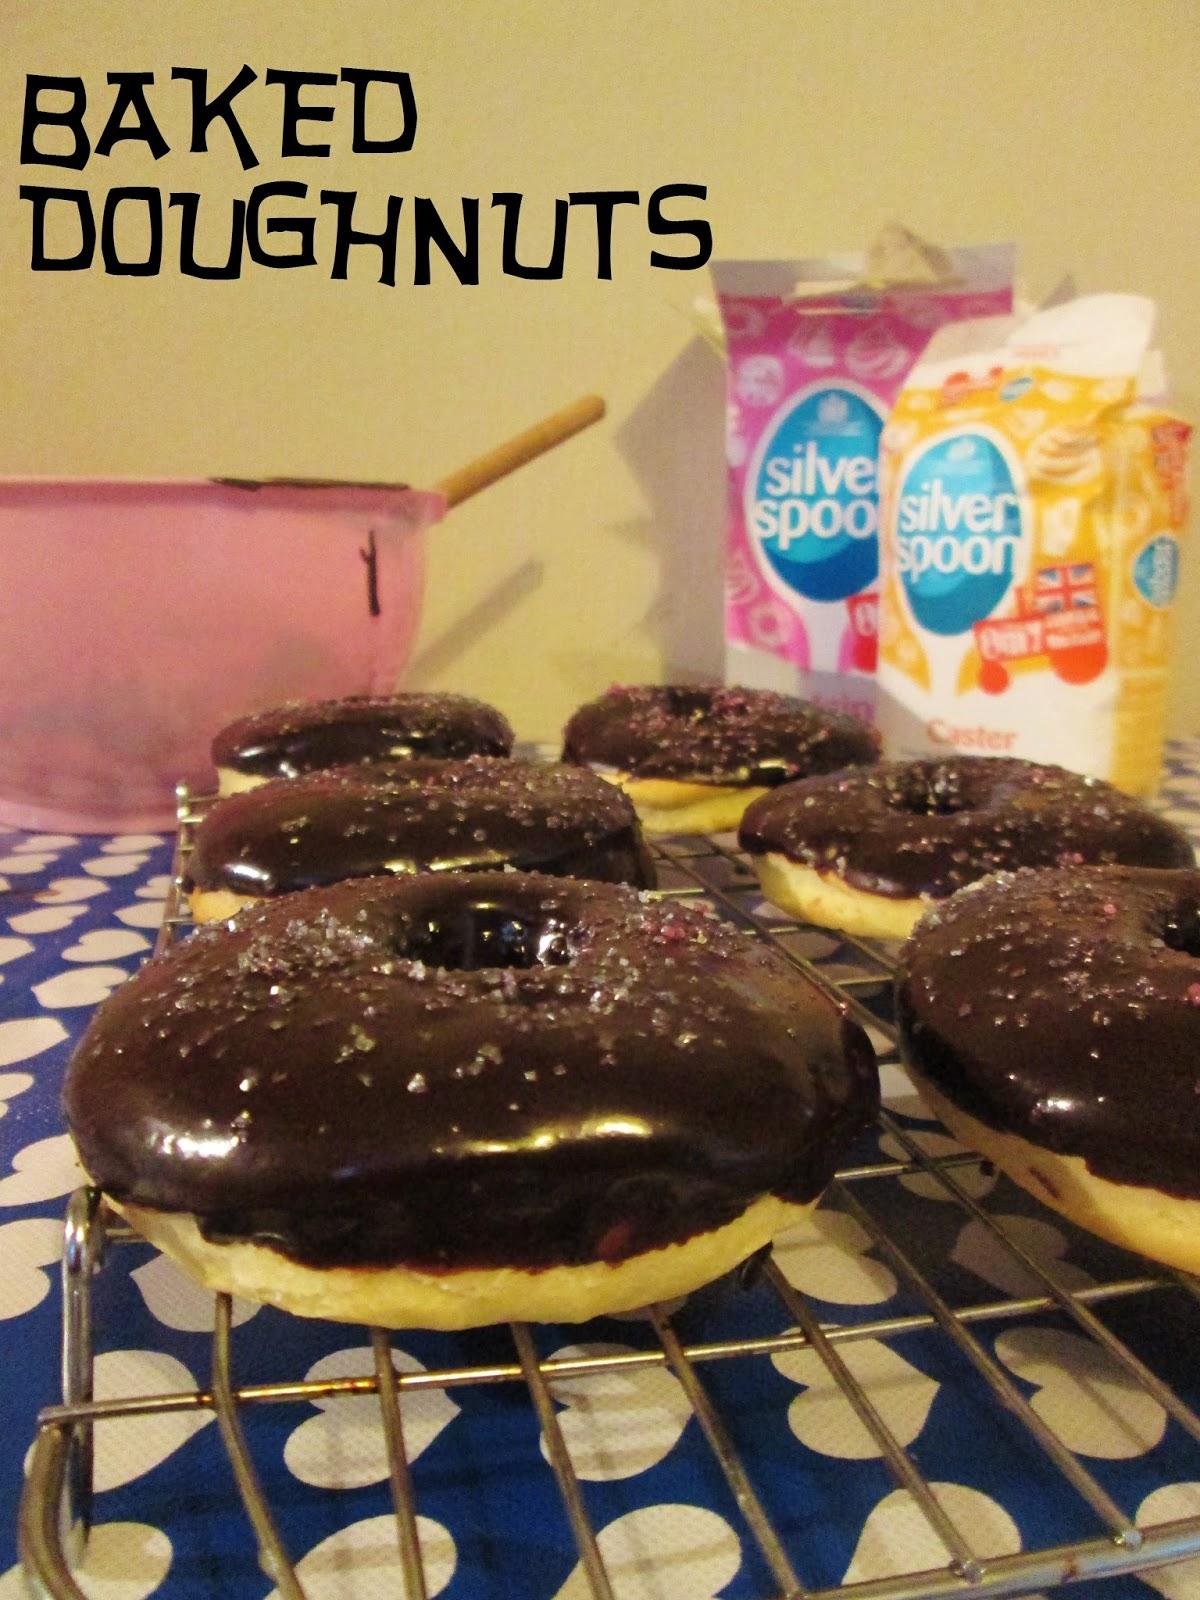 http://themessykitchenuk.blogspot.co.uk/2013/09/baked-doughnuts.html